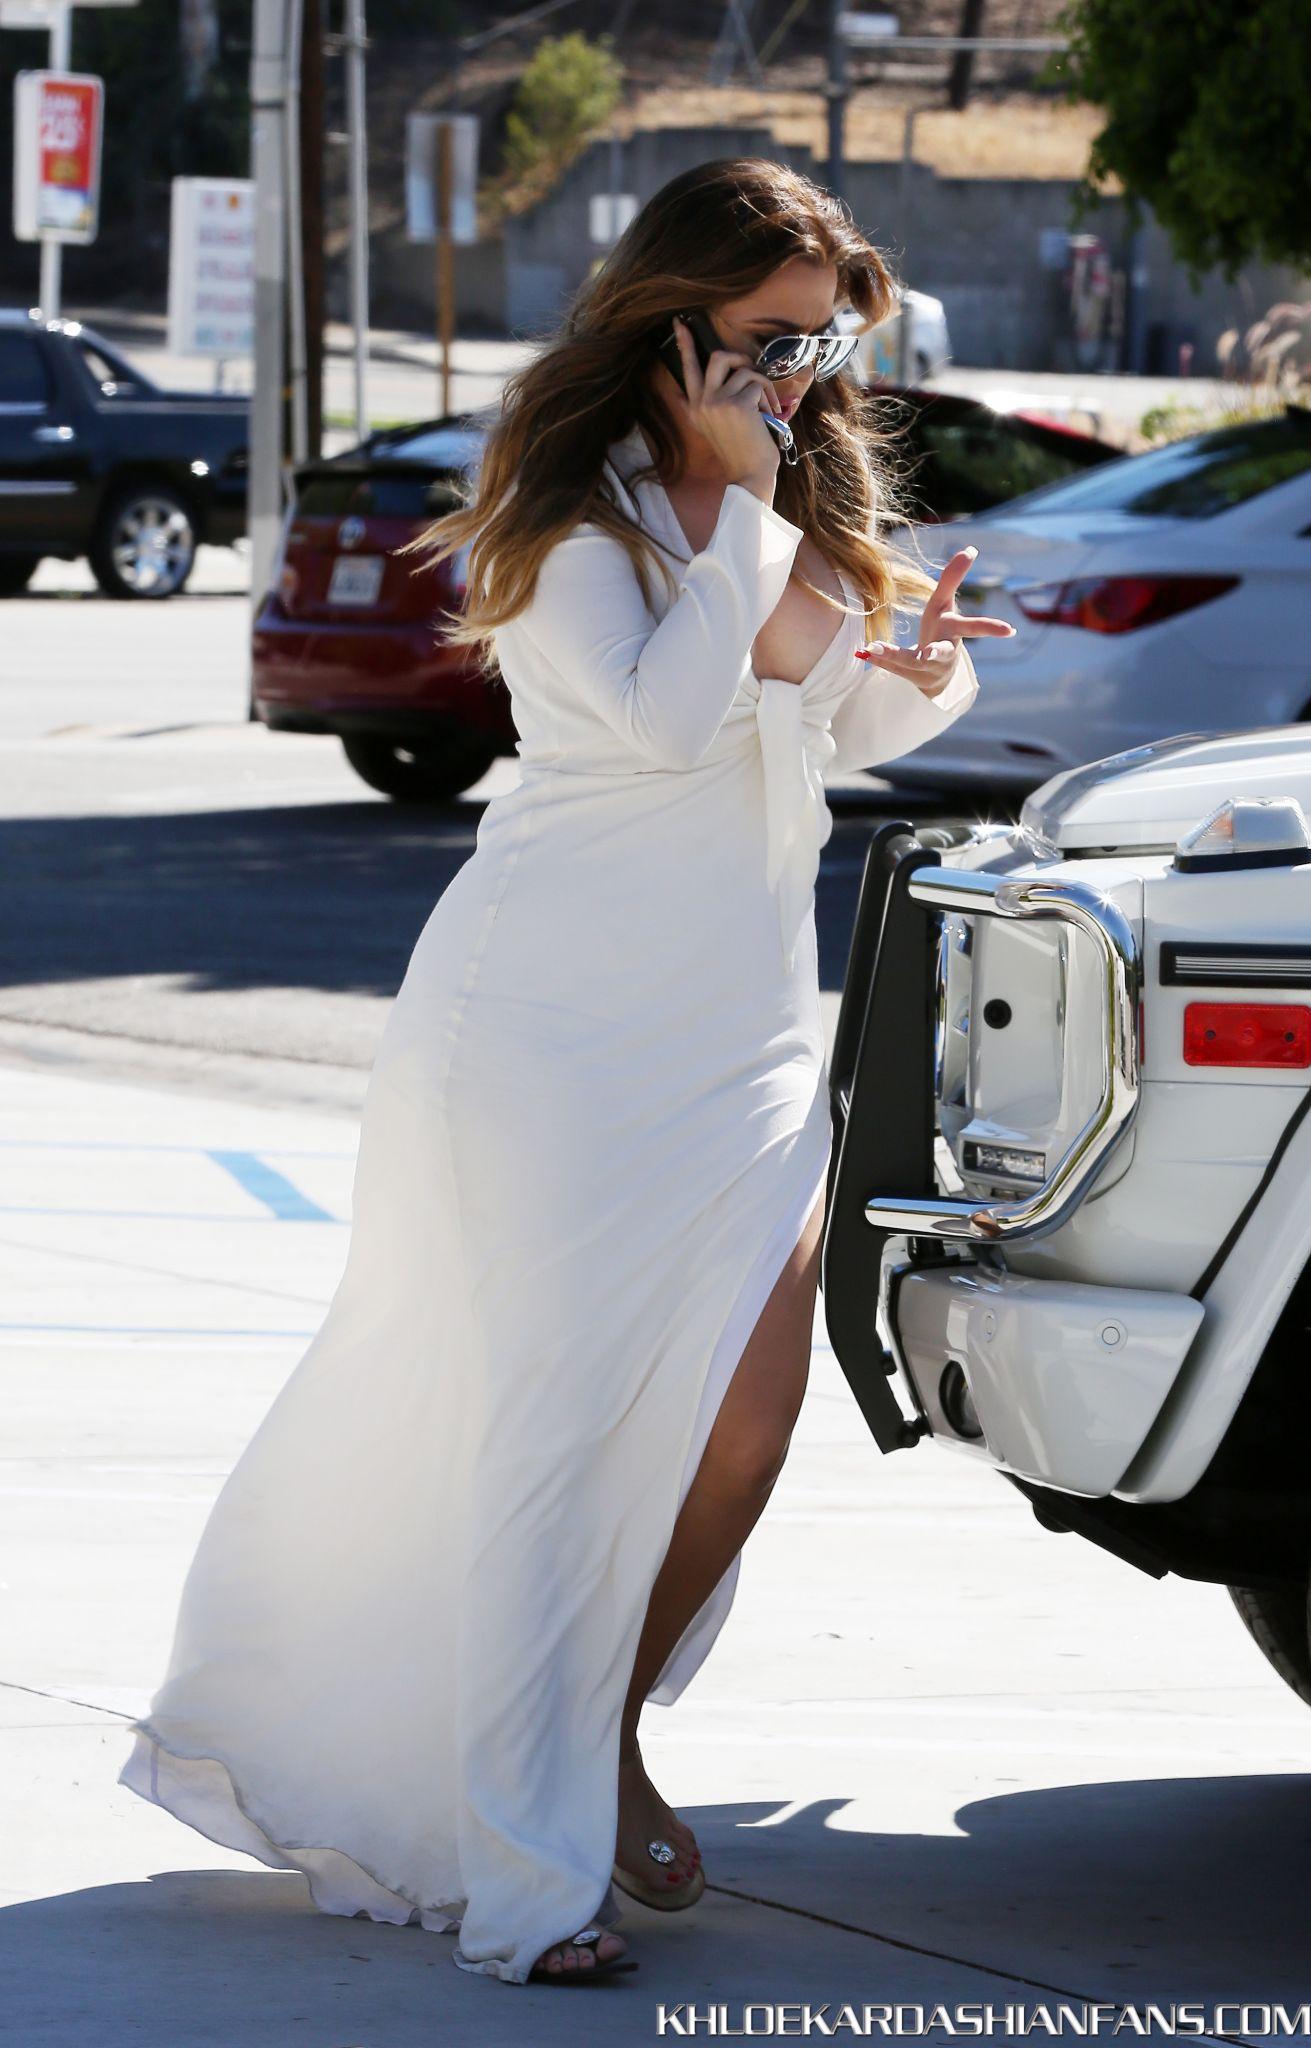 Khloe Kardashian 2014 : Khloe Kardashian in White Dress -14